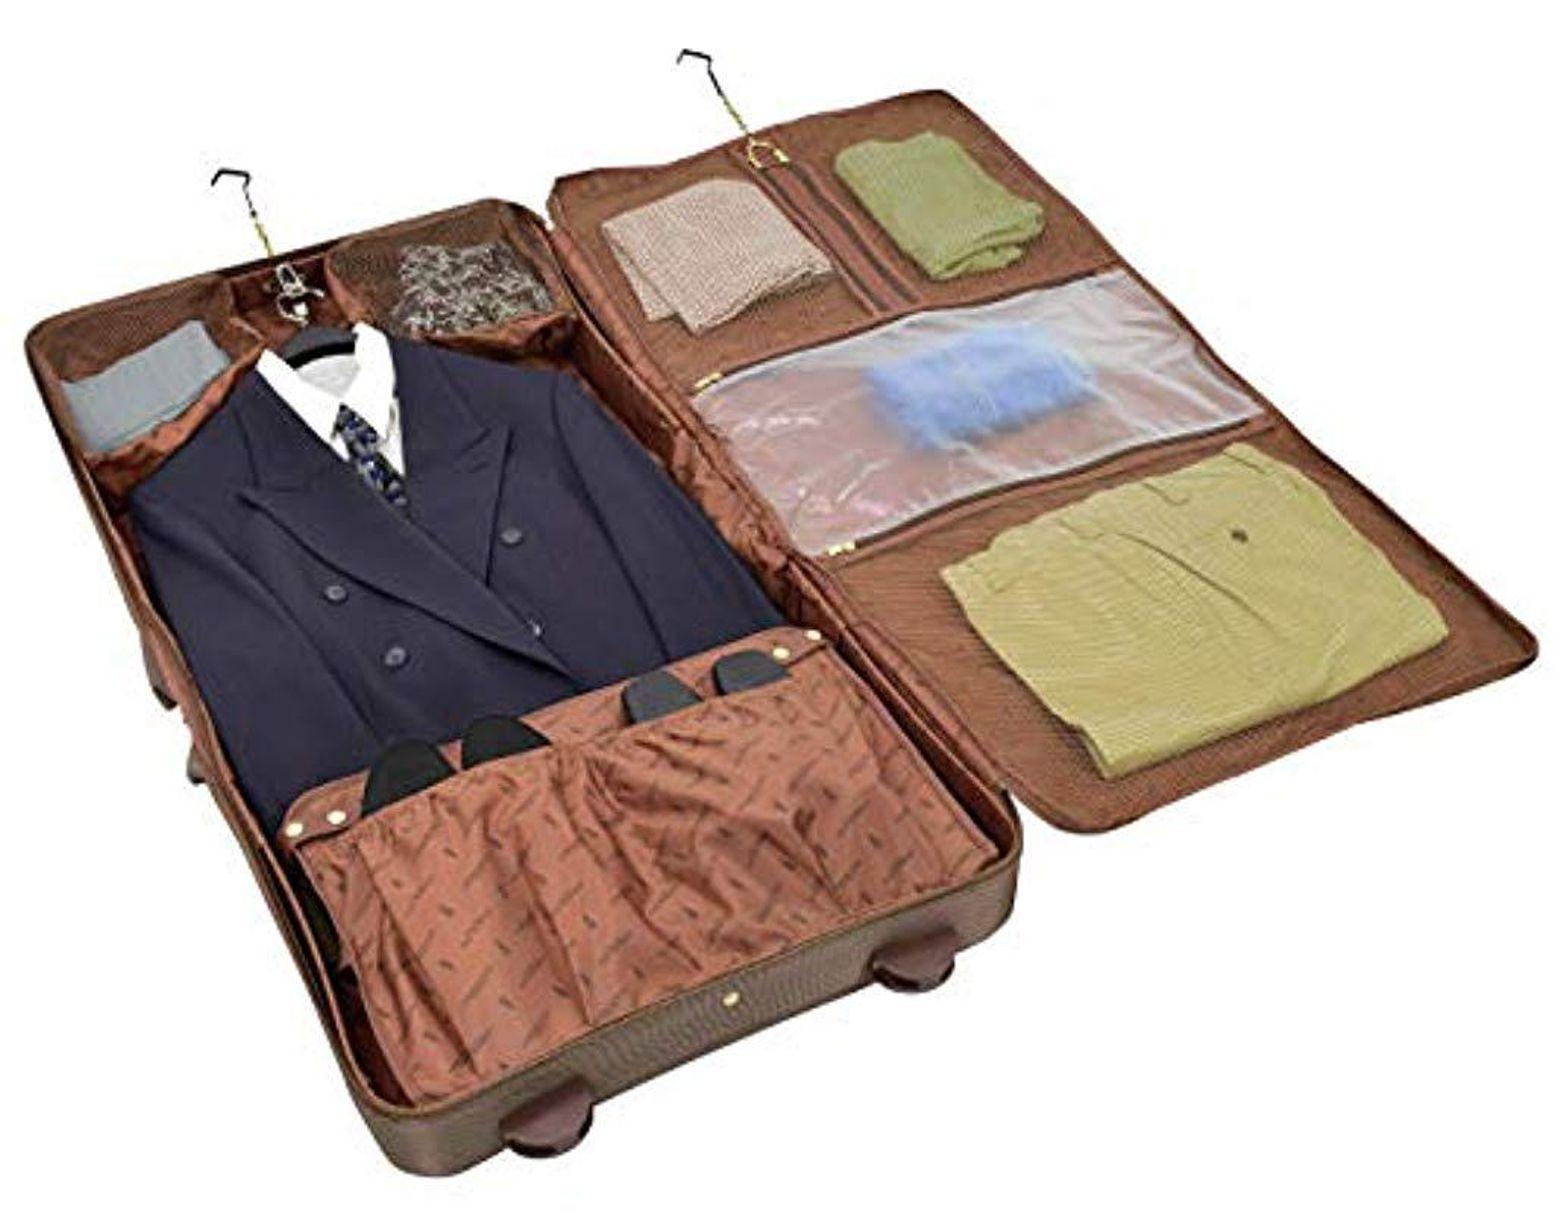 Kensington Ii 44 Wheeled Garment Bag